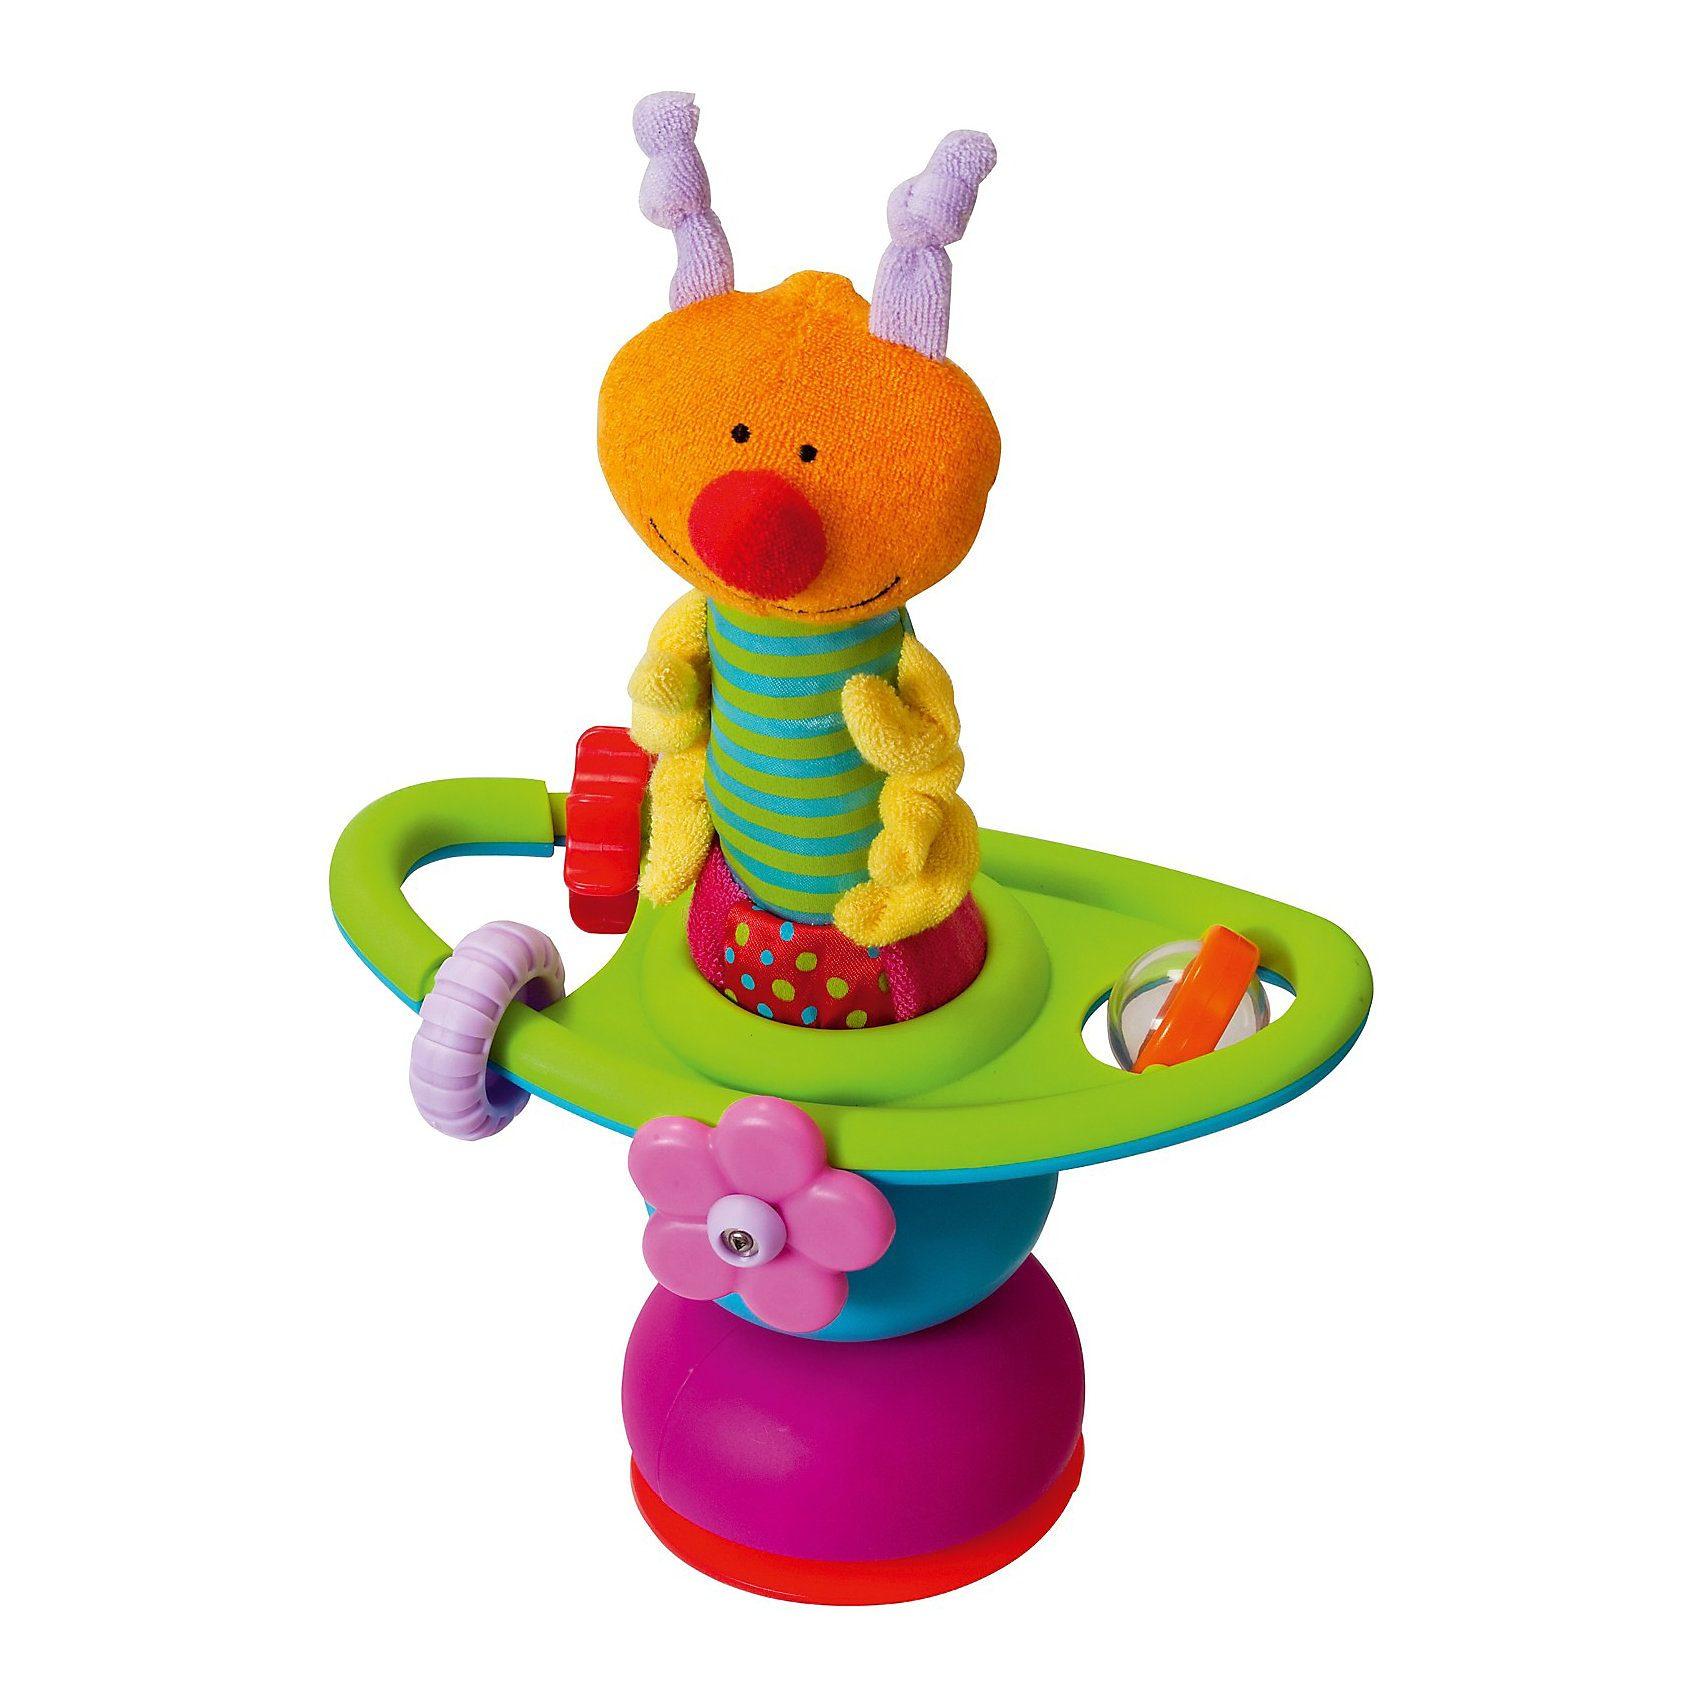 TAF TOYS 10915 Hochstuhlspielzeug Mini Tischkarussel